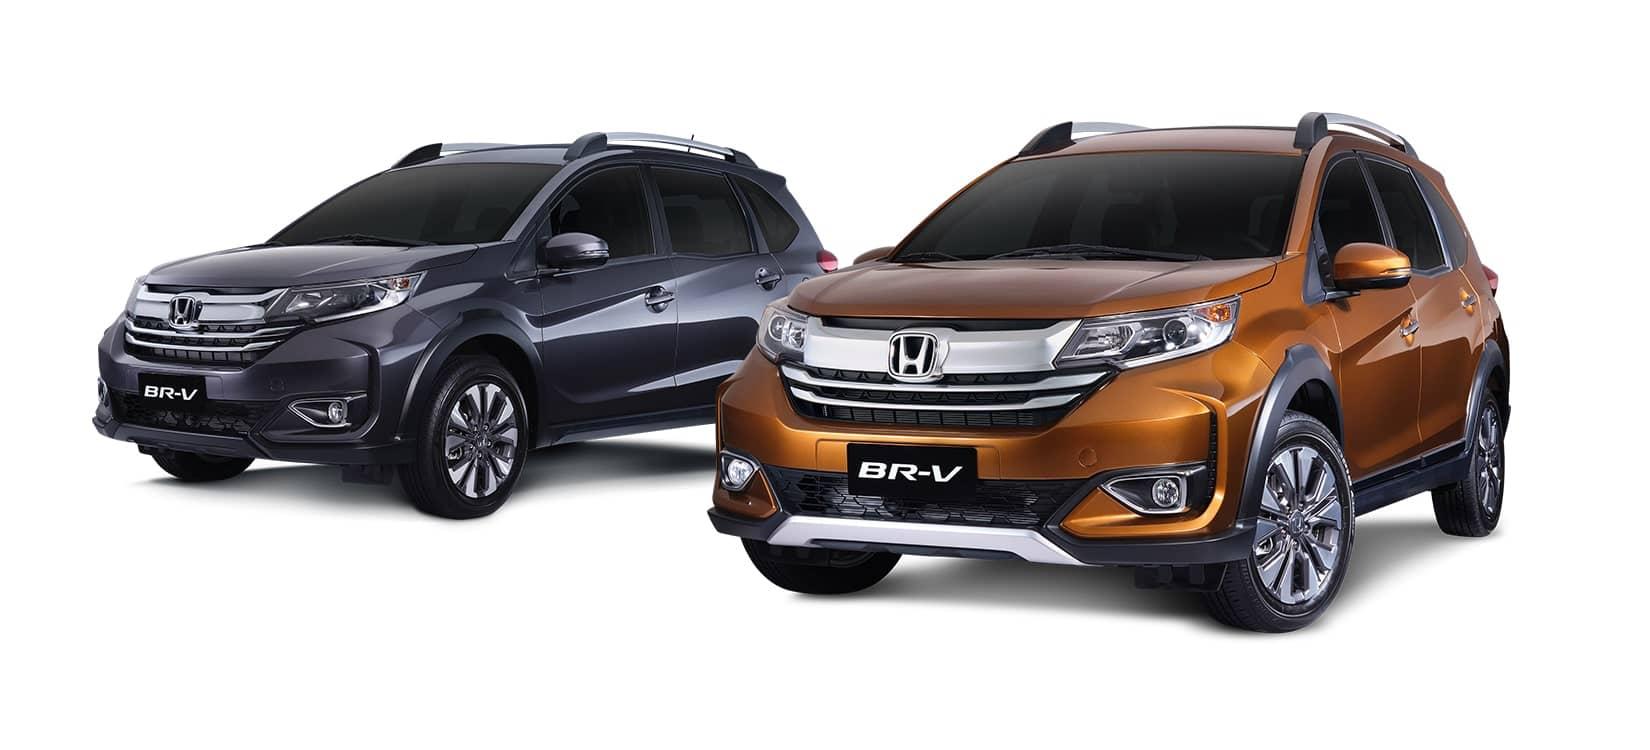 Honda debuts refreshed BR-V